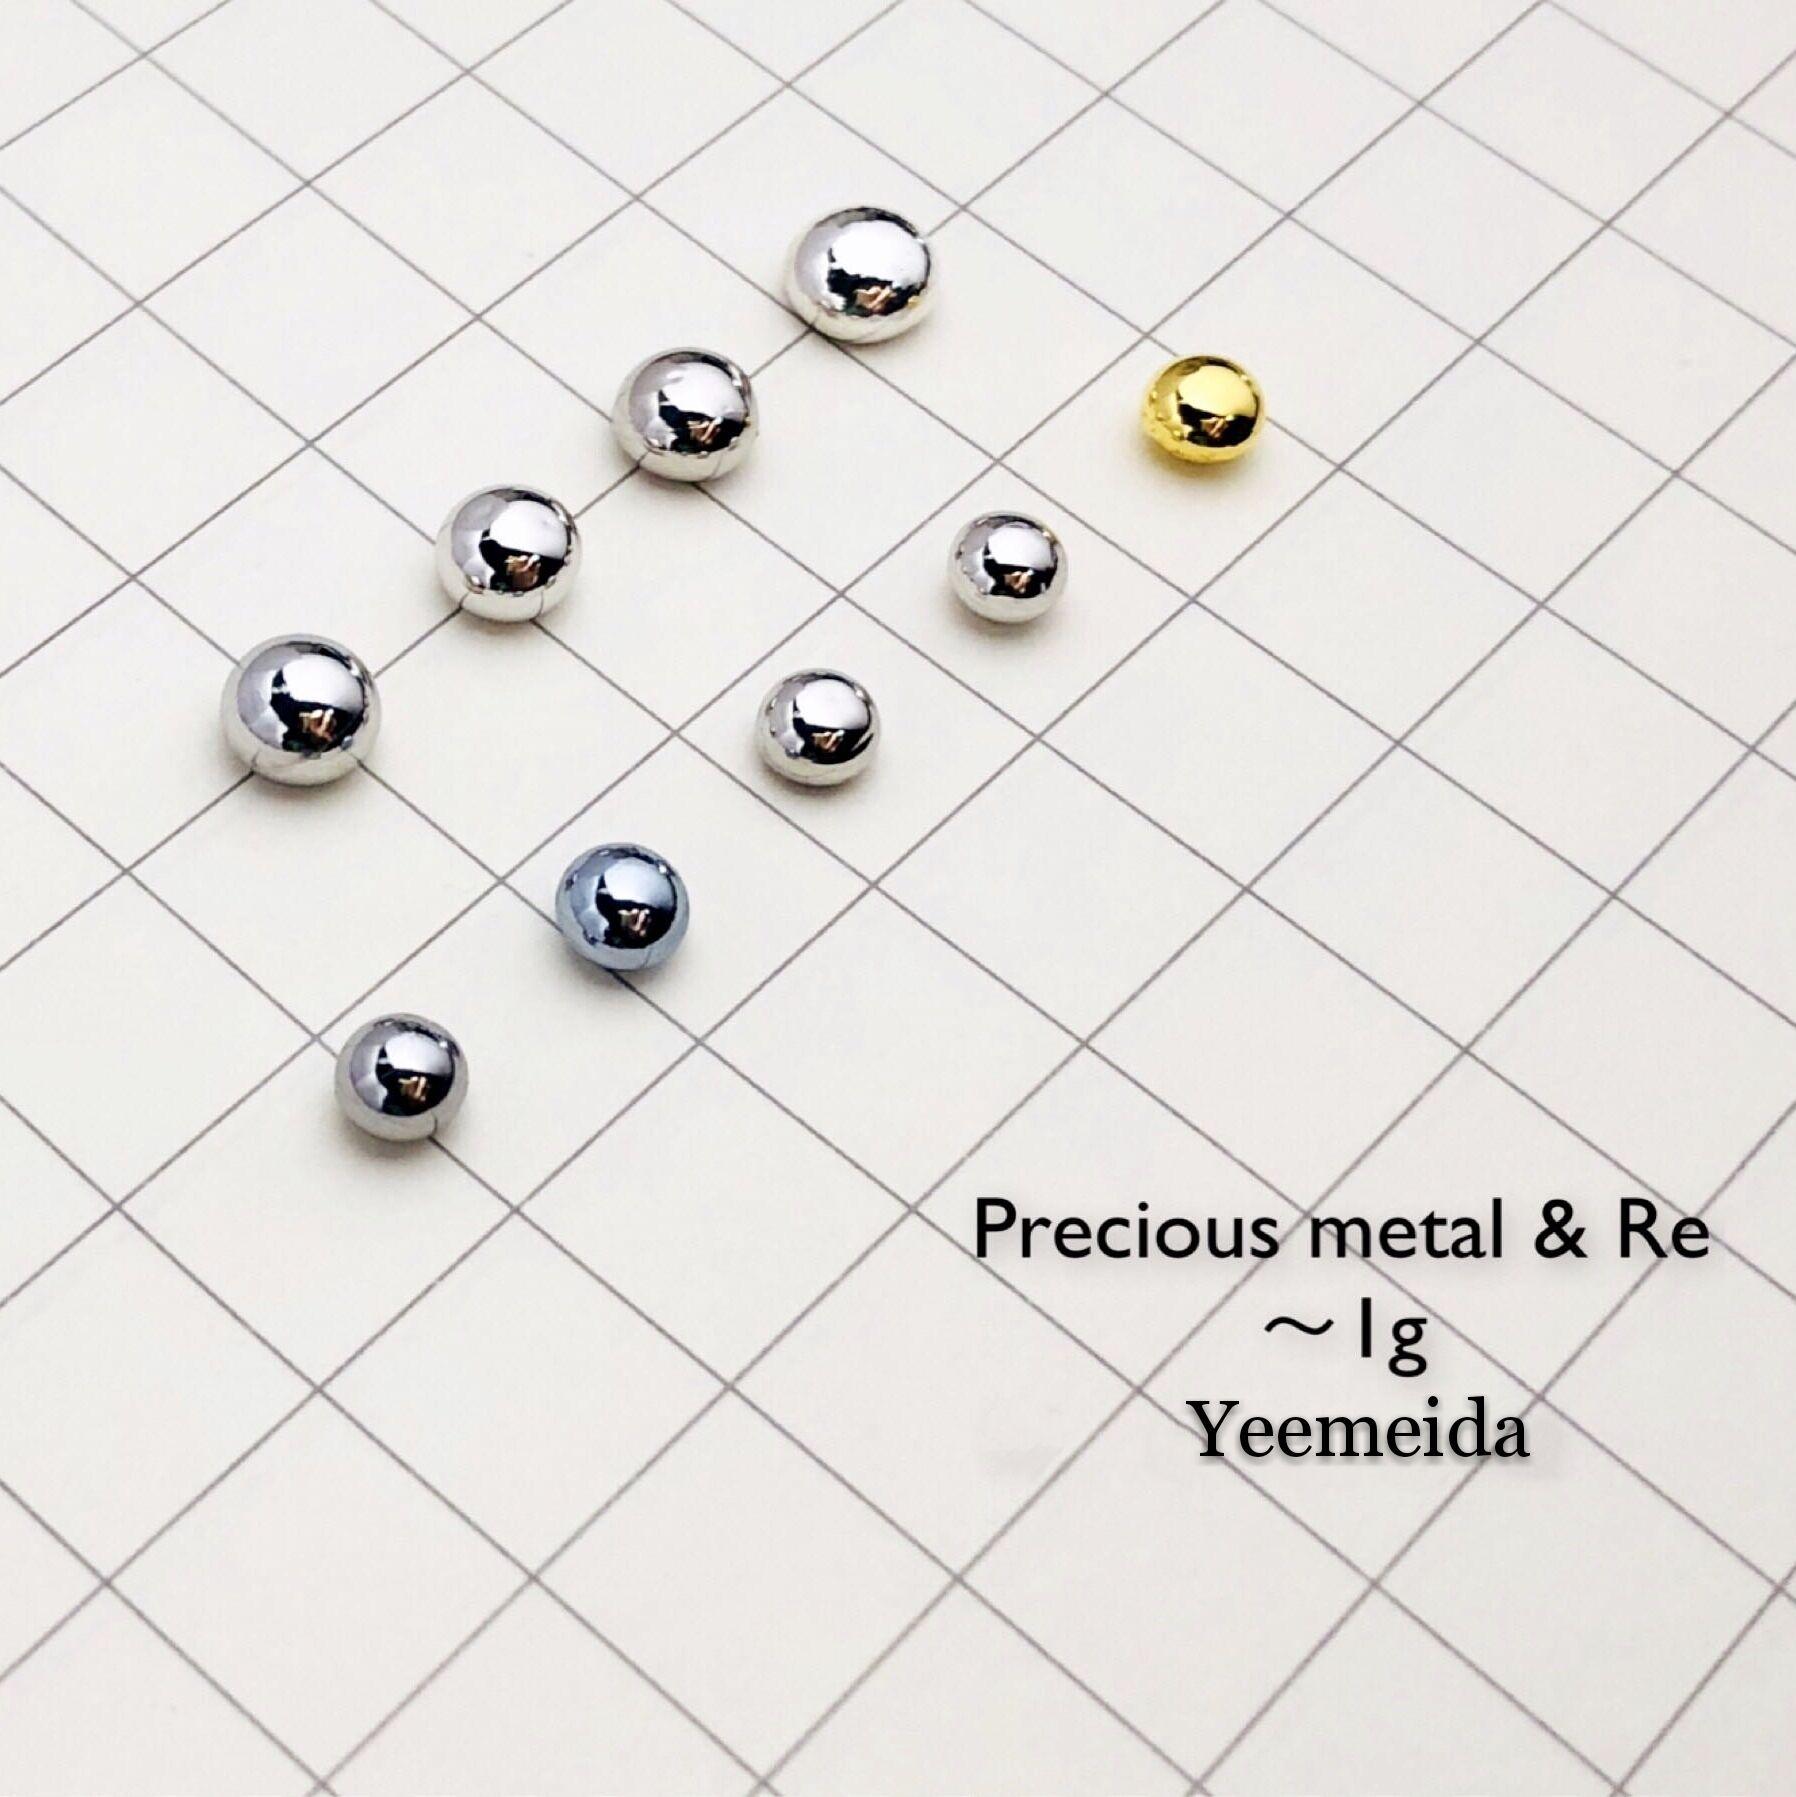 Metal precioso osmio rutenio oro platino rodio paladio iridio plata Metal renio